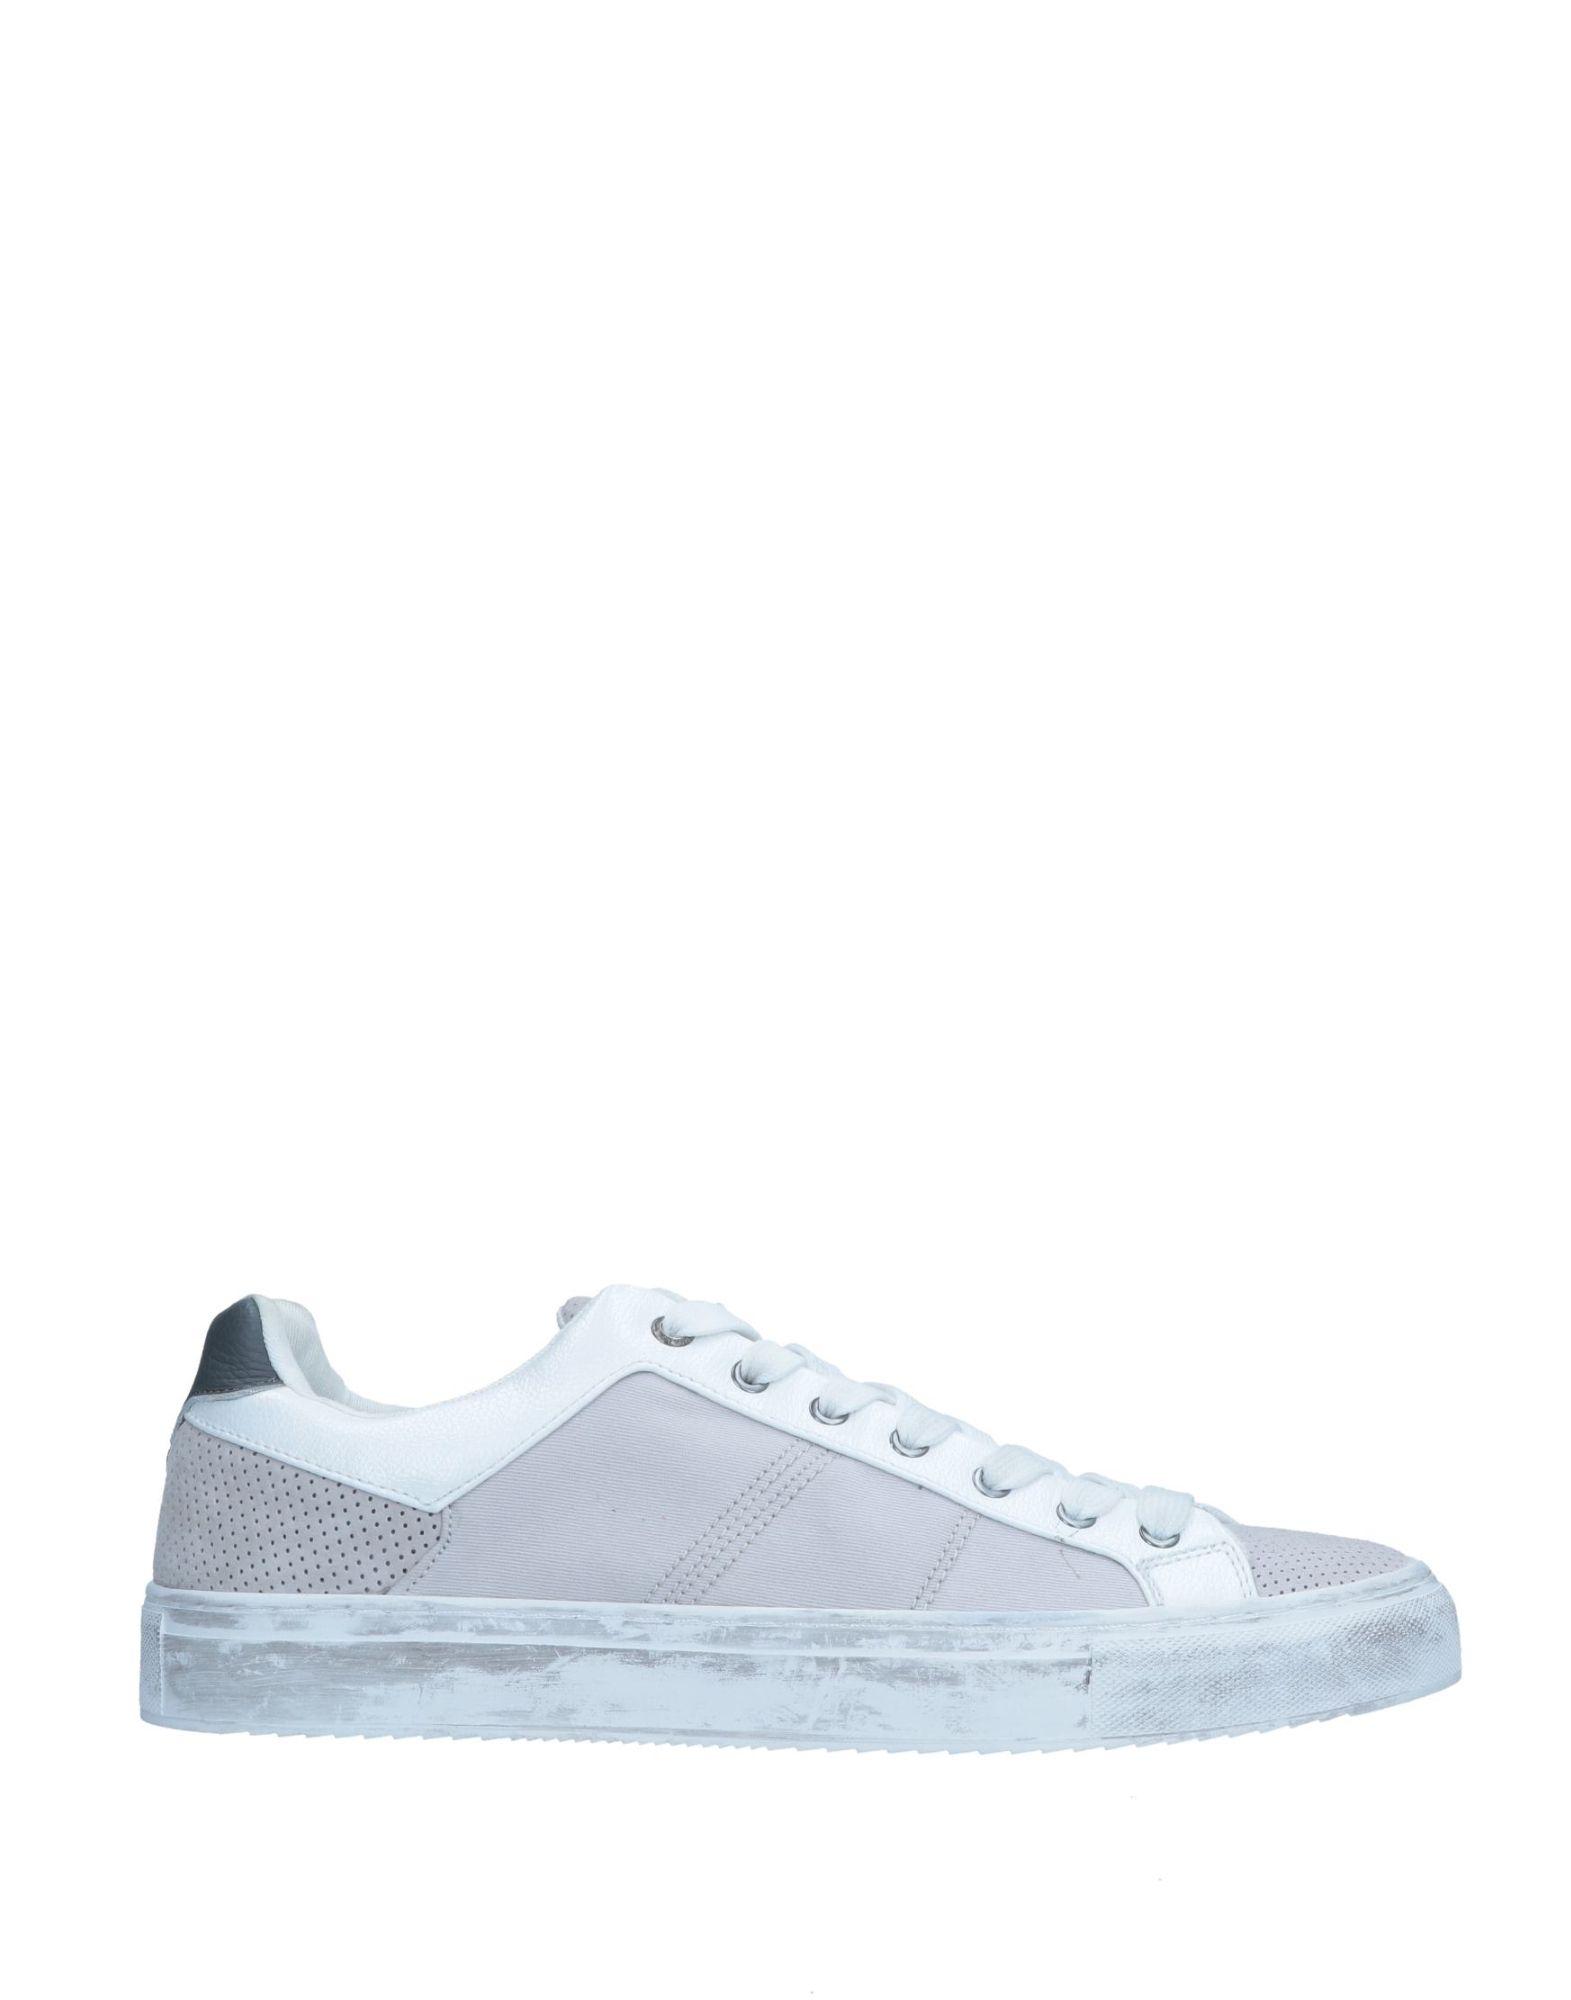 Sneakers Colmar Uomo - 11546535JL elegante